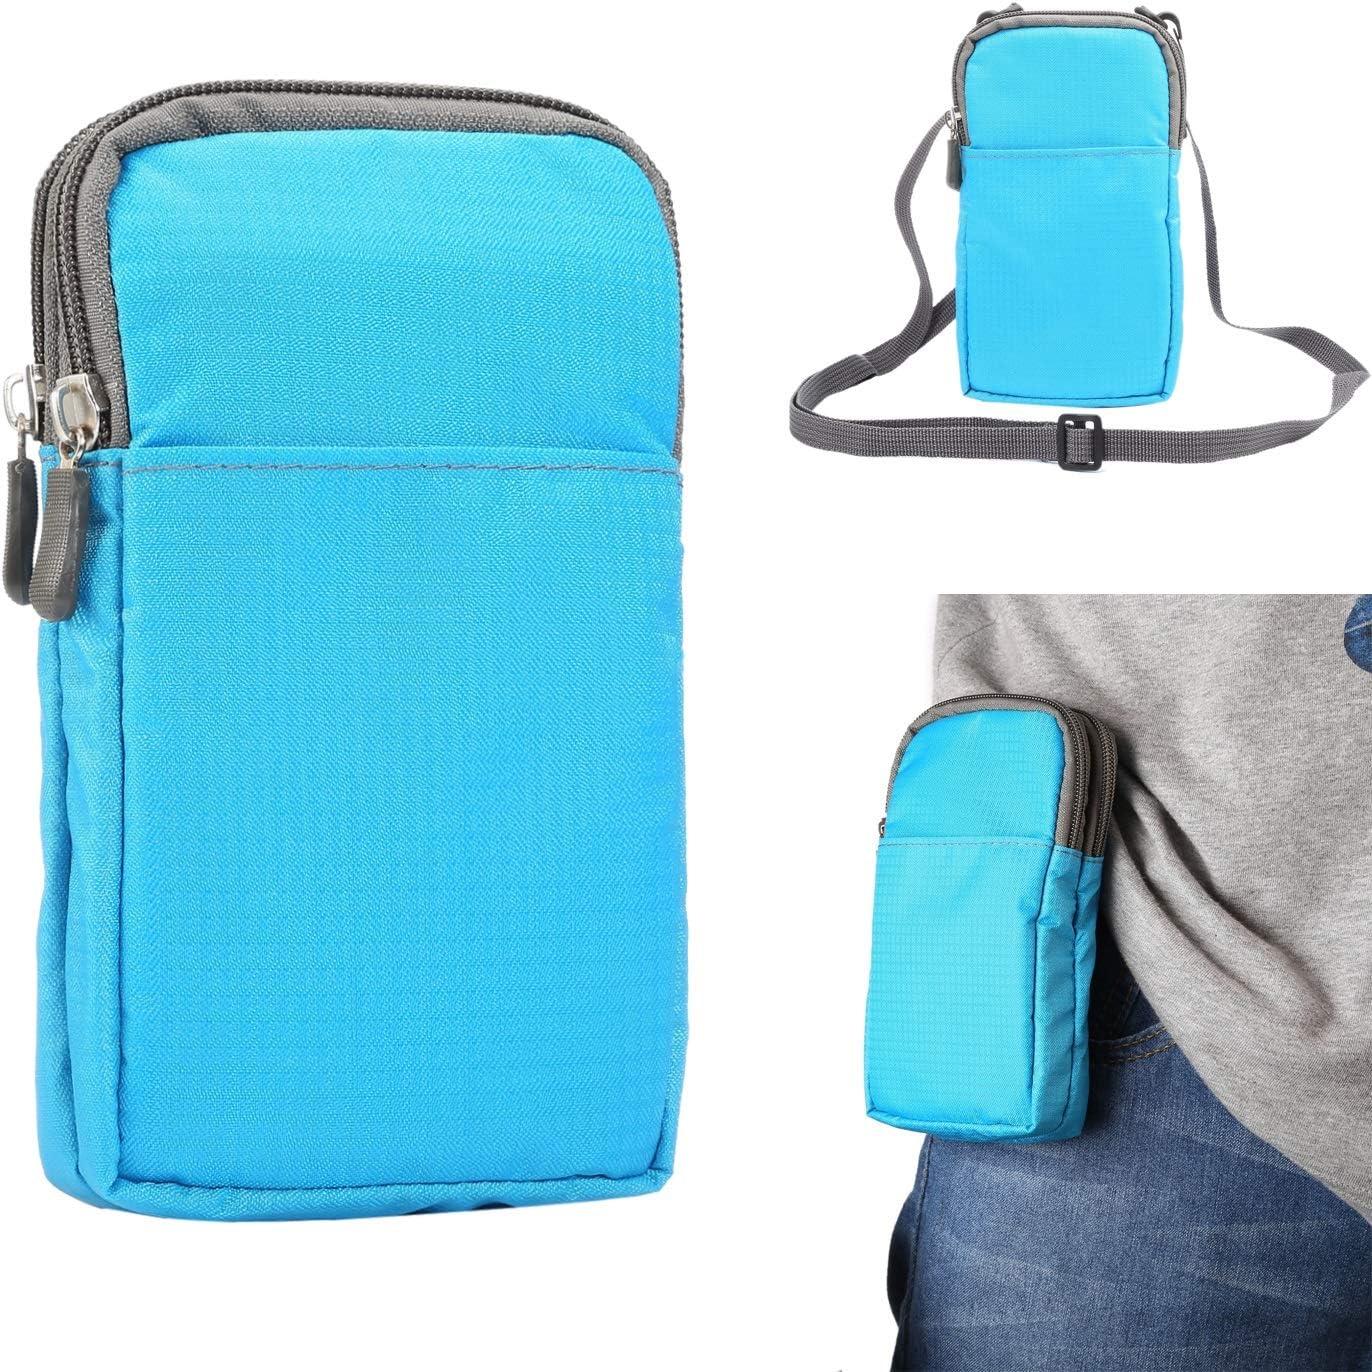 Sports Running Belt Waist Pack, Small Crossbody Bags for Men Women, 6.0 Inch Phone Wallet Case Pouch Shoulder Bag Belt Clip Holster Waist Bag Travelling Money Cell Phone Holder ( Color : Baby Blue )